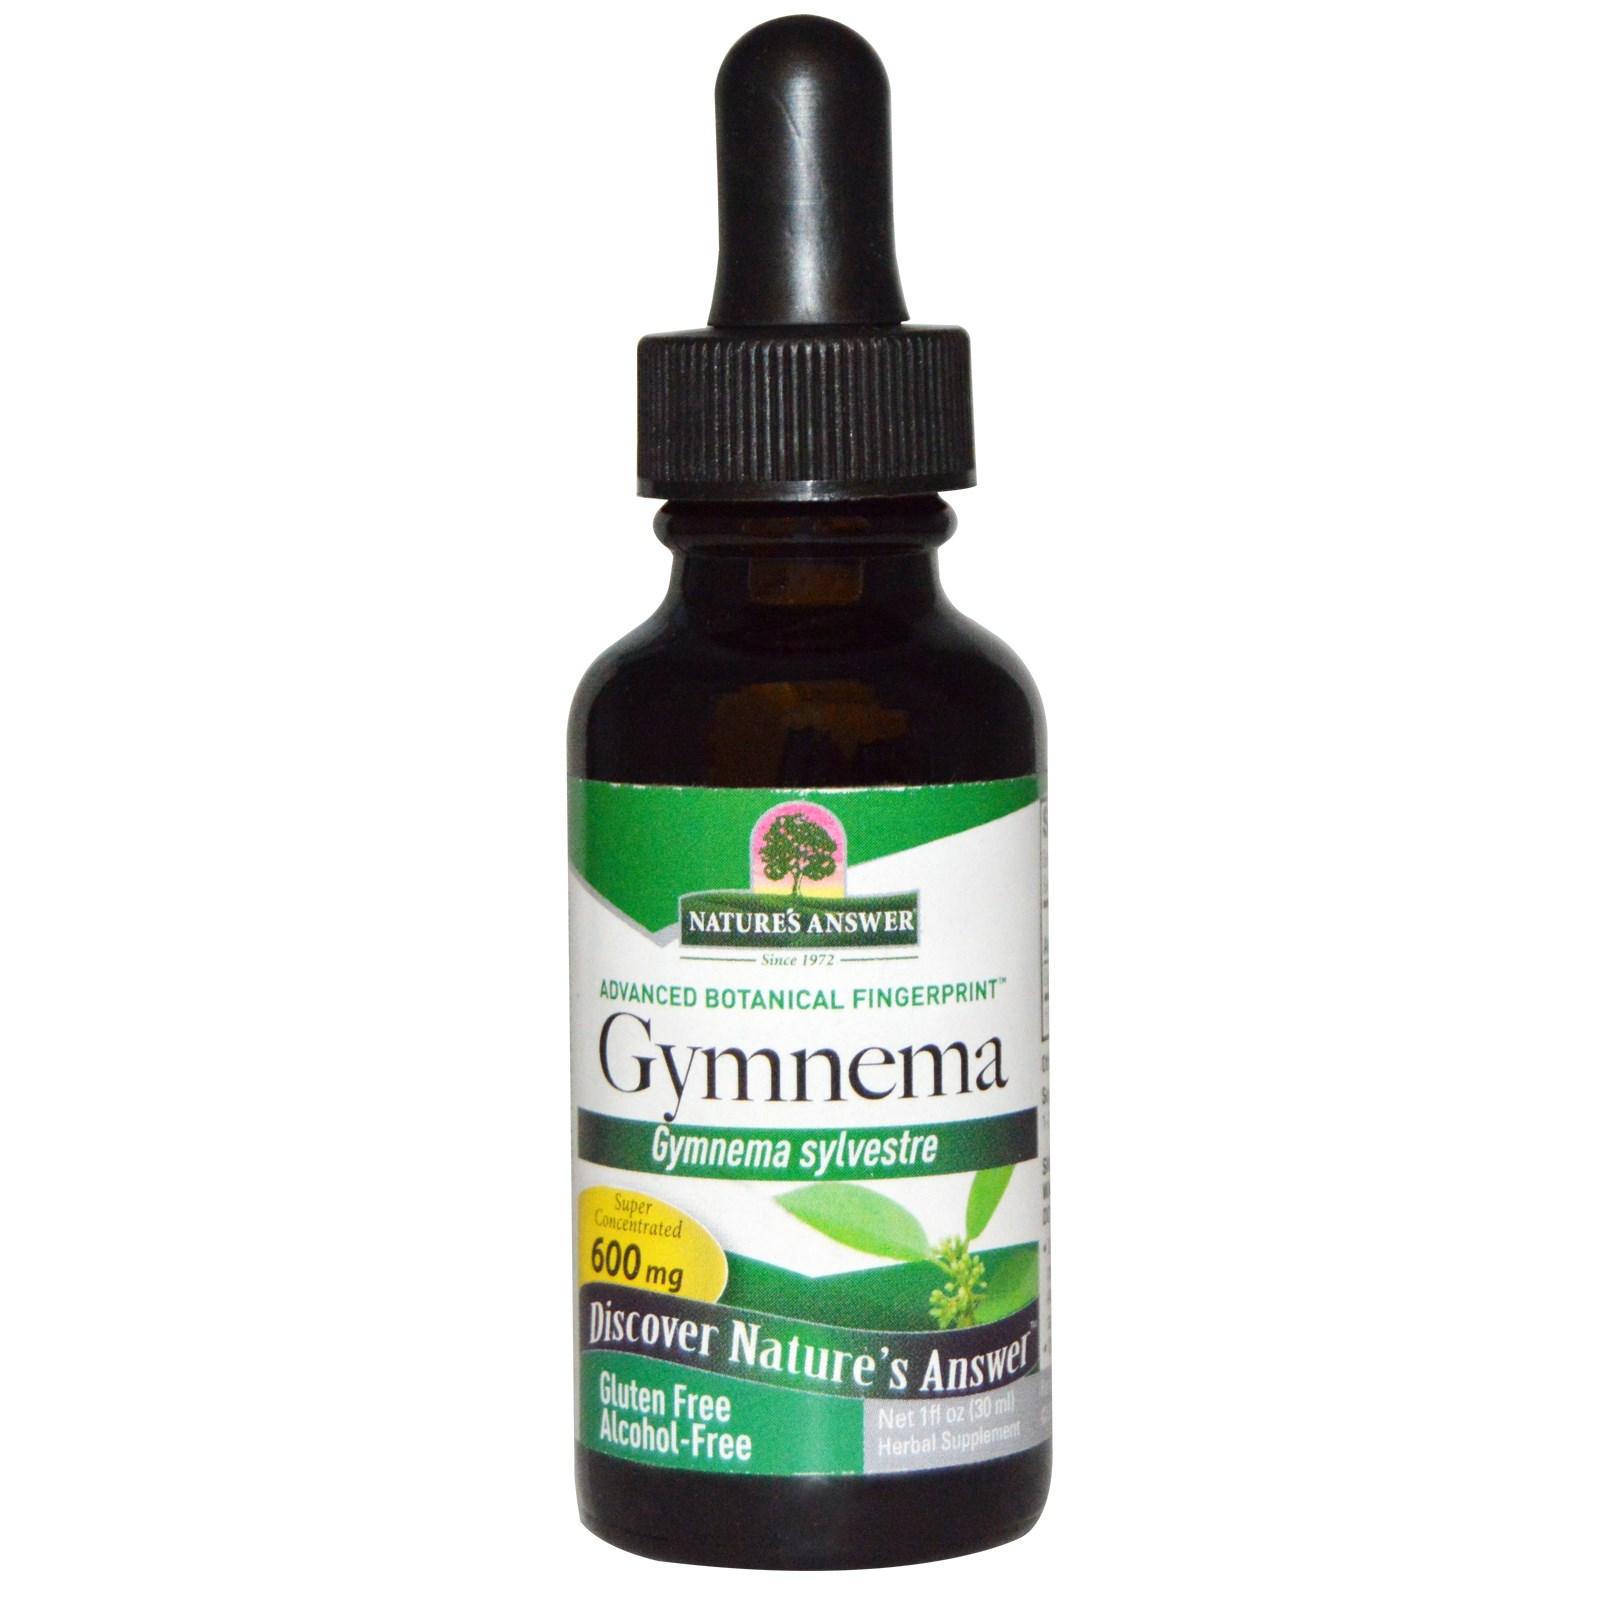 Image of Gymnema, Alcohol-Free, 600 mg (30 ml) - Nature's Answer 0083000006319